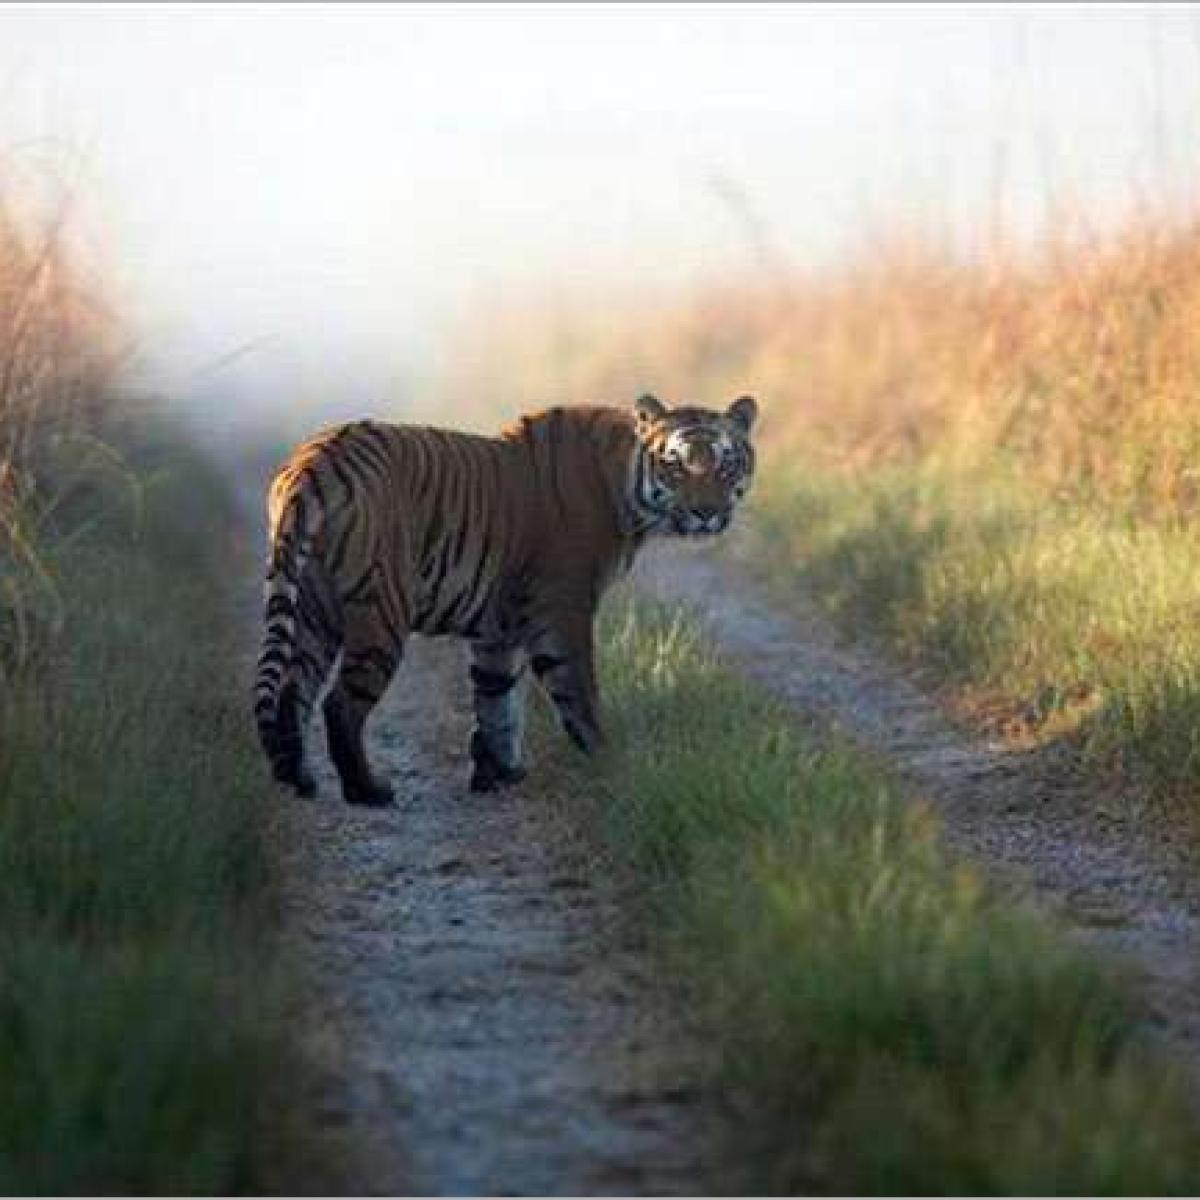 Maharashtra: Tiger kills woman in Chandrapur